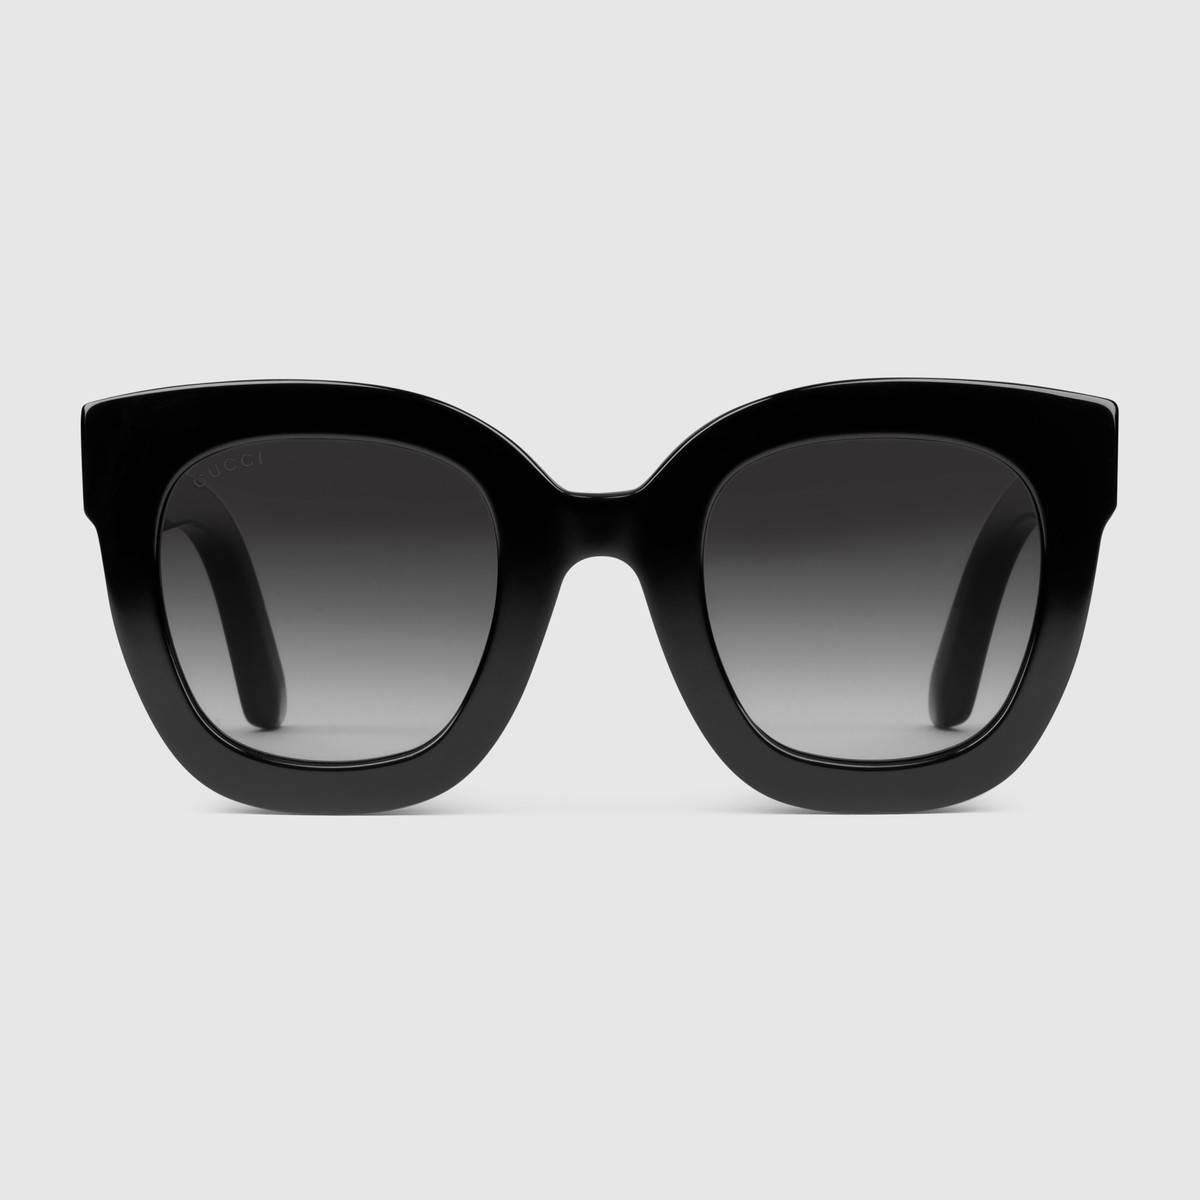 Gafas de sol de Gucci (290 euros).